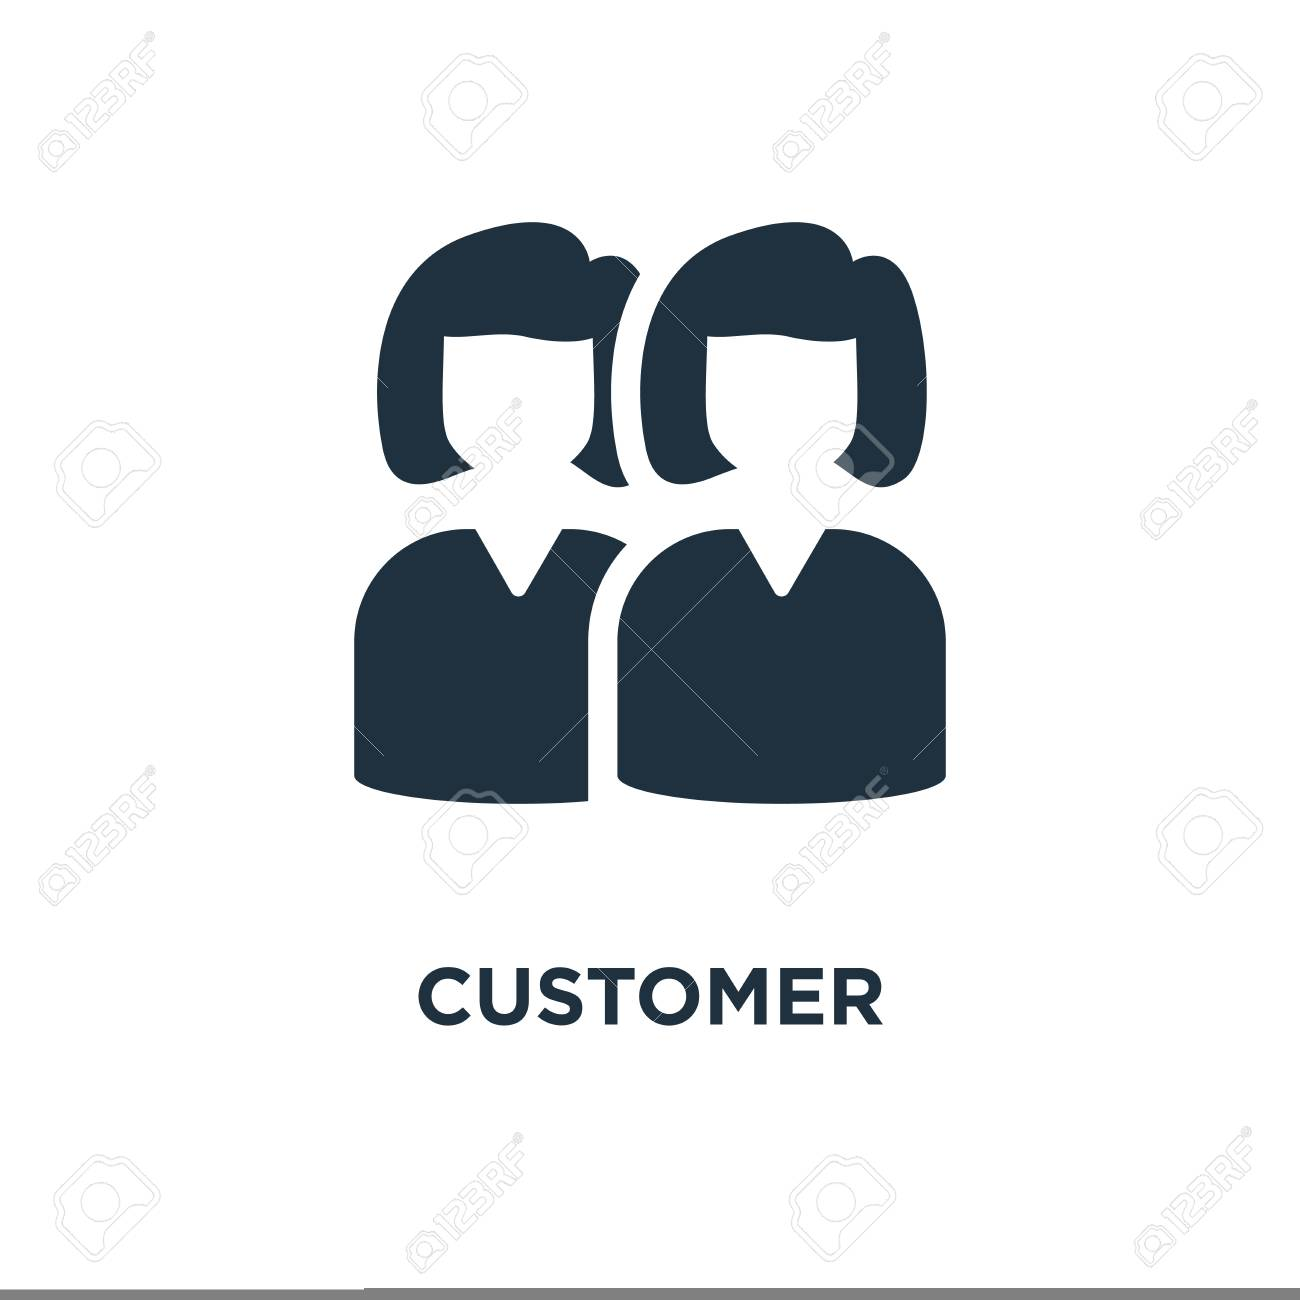 Customer Icon Black Filled Vector Illustration Customer Symbol Royalty Free Cliparts Vectors And Stock Illustration Image 112693095 Customer free icons and premium icon packs. customer icon black filled vector illustration customer symbol